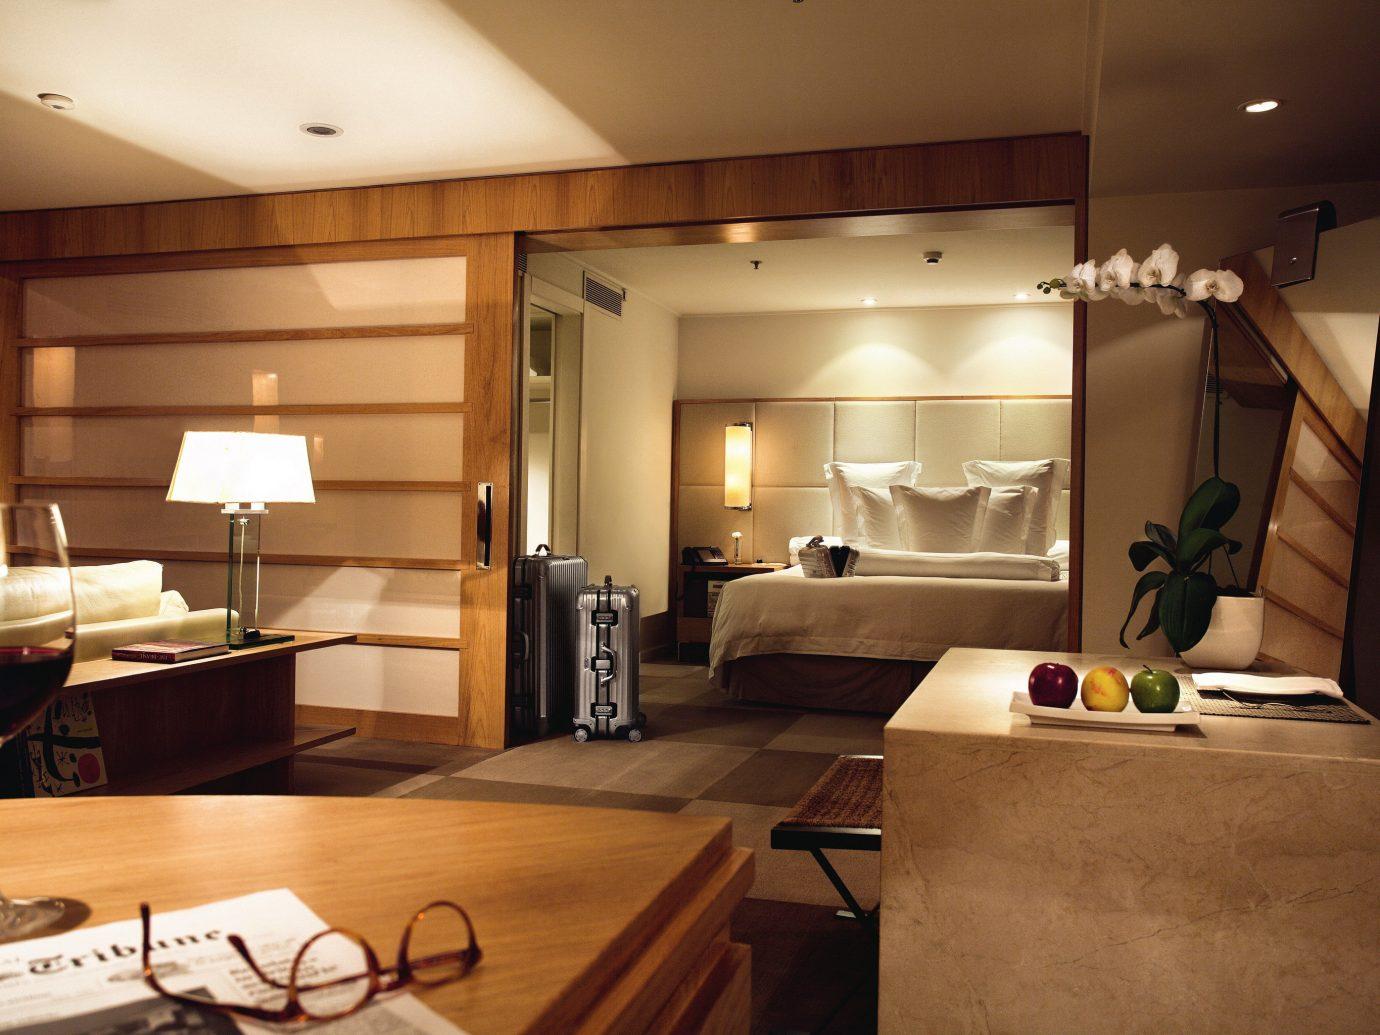 Hotels indoor ceiling wall floor room interior design living room Suite interior designer furniture Modern